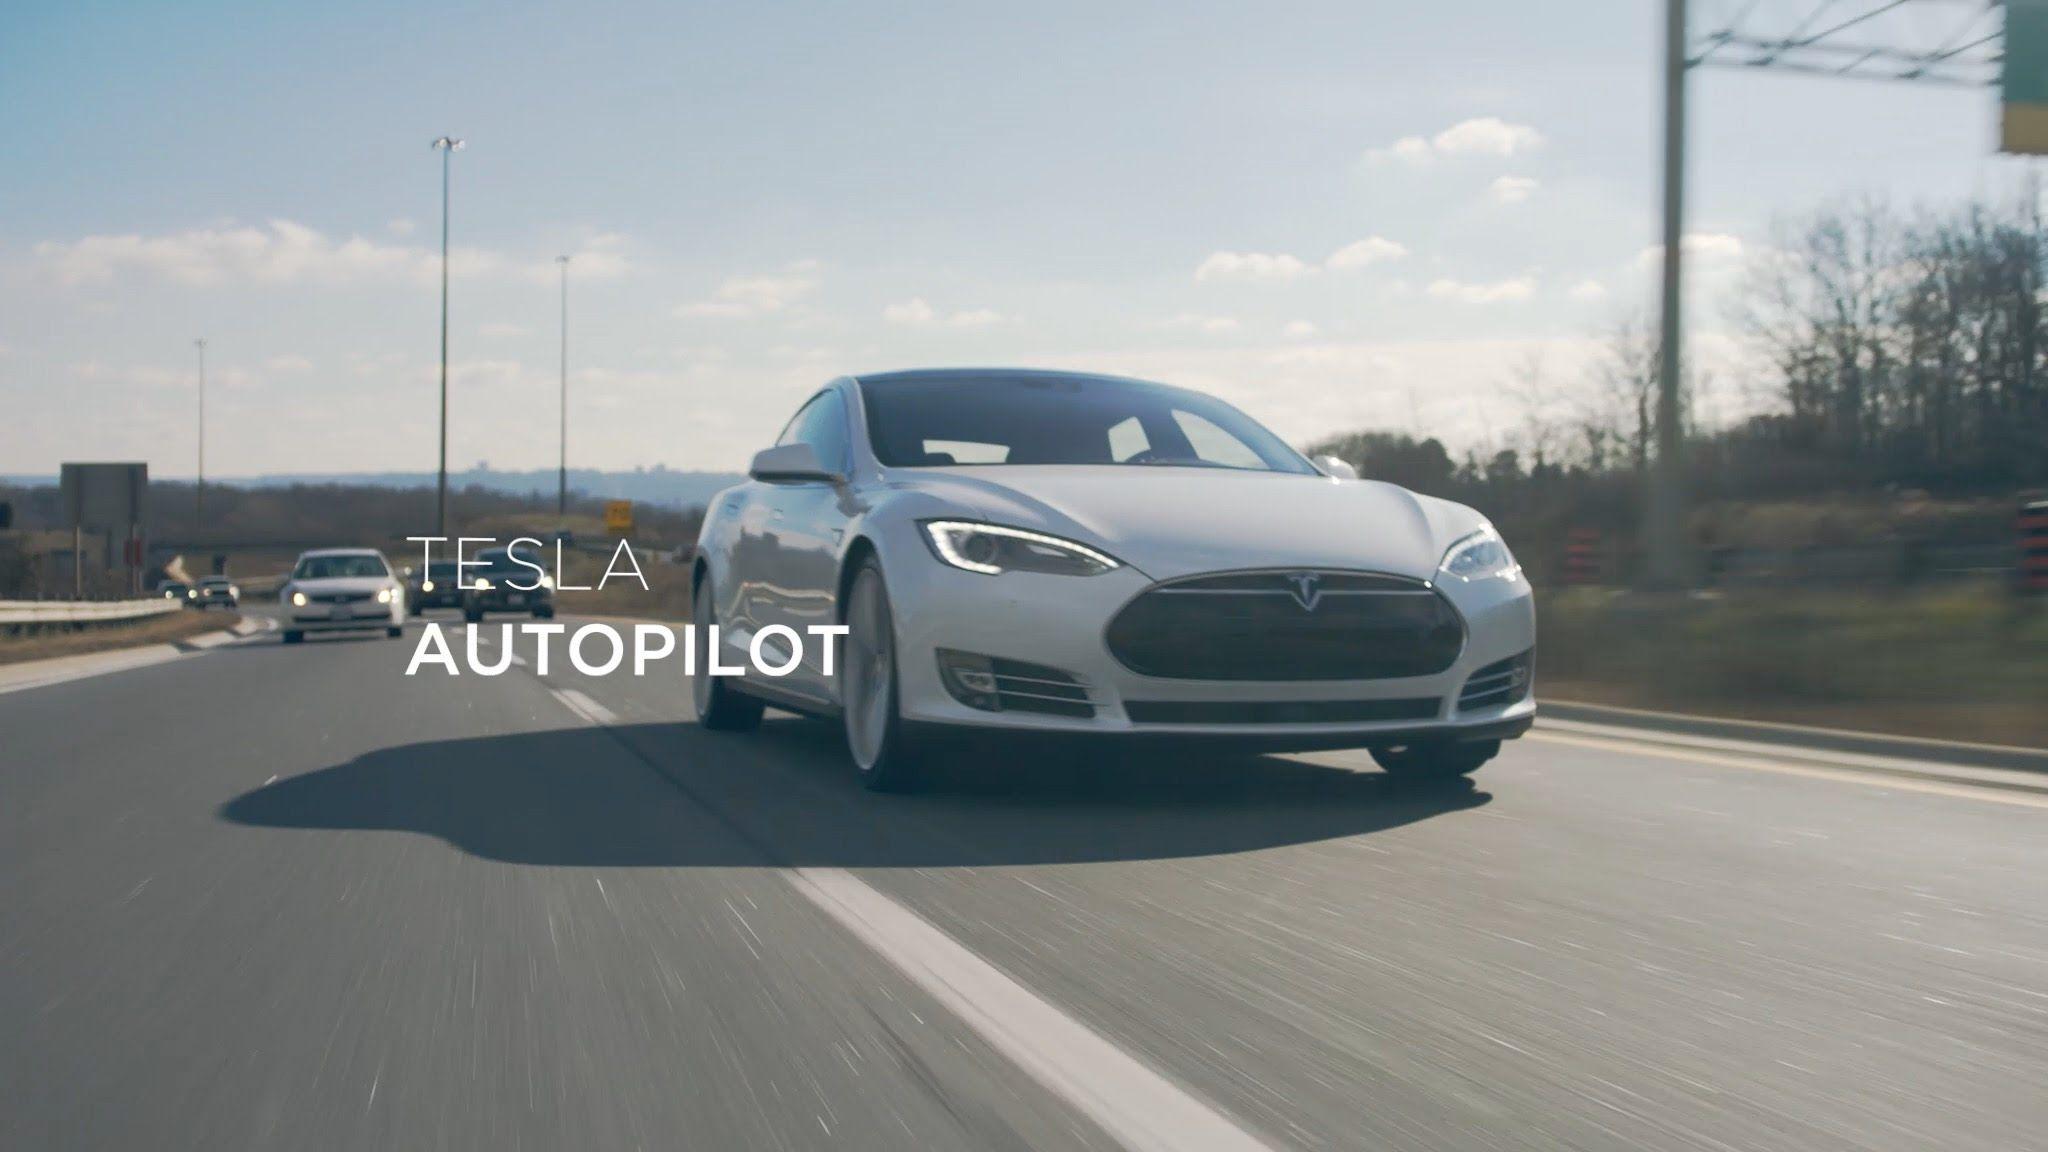 Revolutionize Your Commute Https Www Youtube Com Watch V Xb2g7 Hge G Tesla Tesla Model X Cars Uk